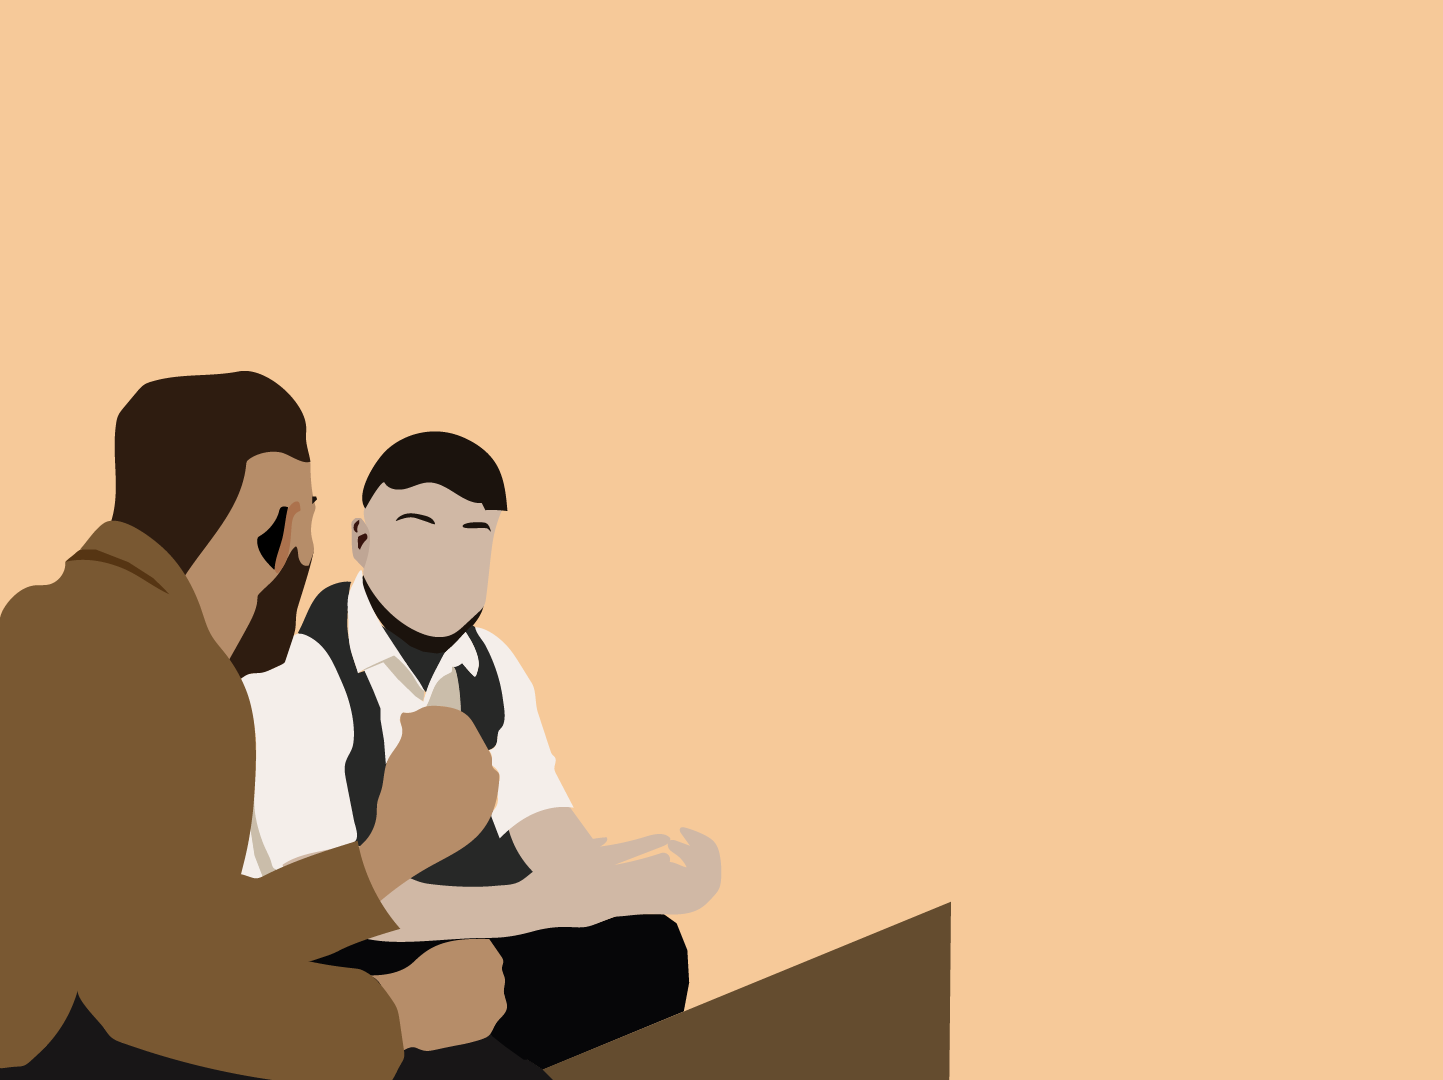 Moodboard Illustration of two men